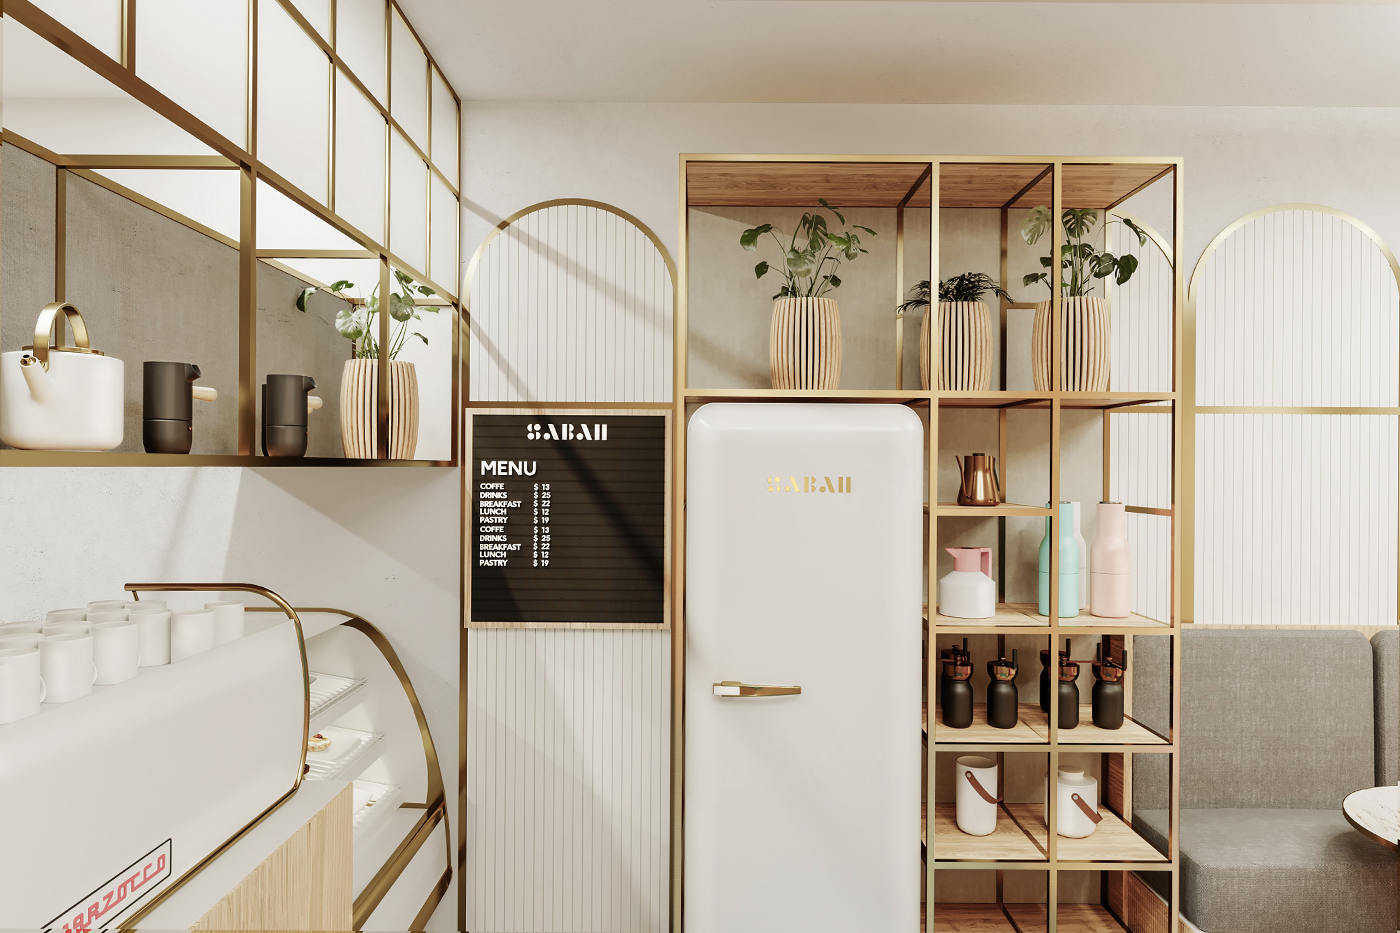 Sabah Brand Identity & Interior Design by Futura .